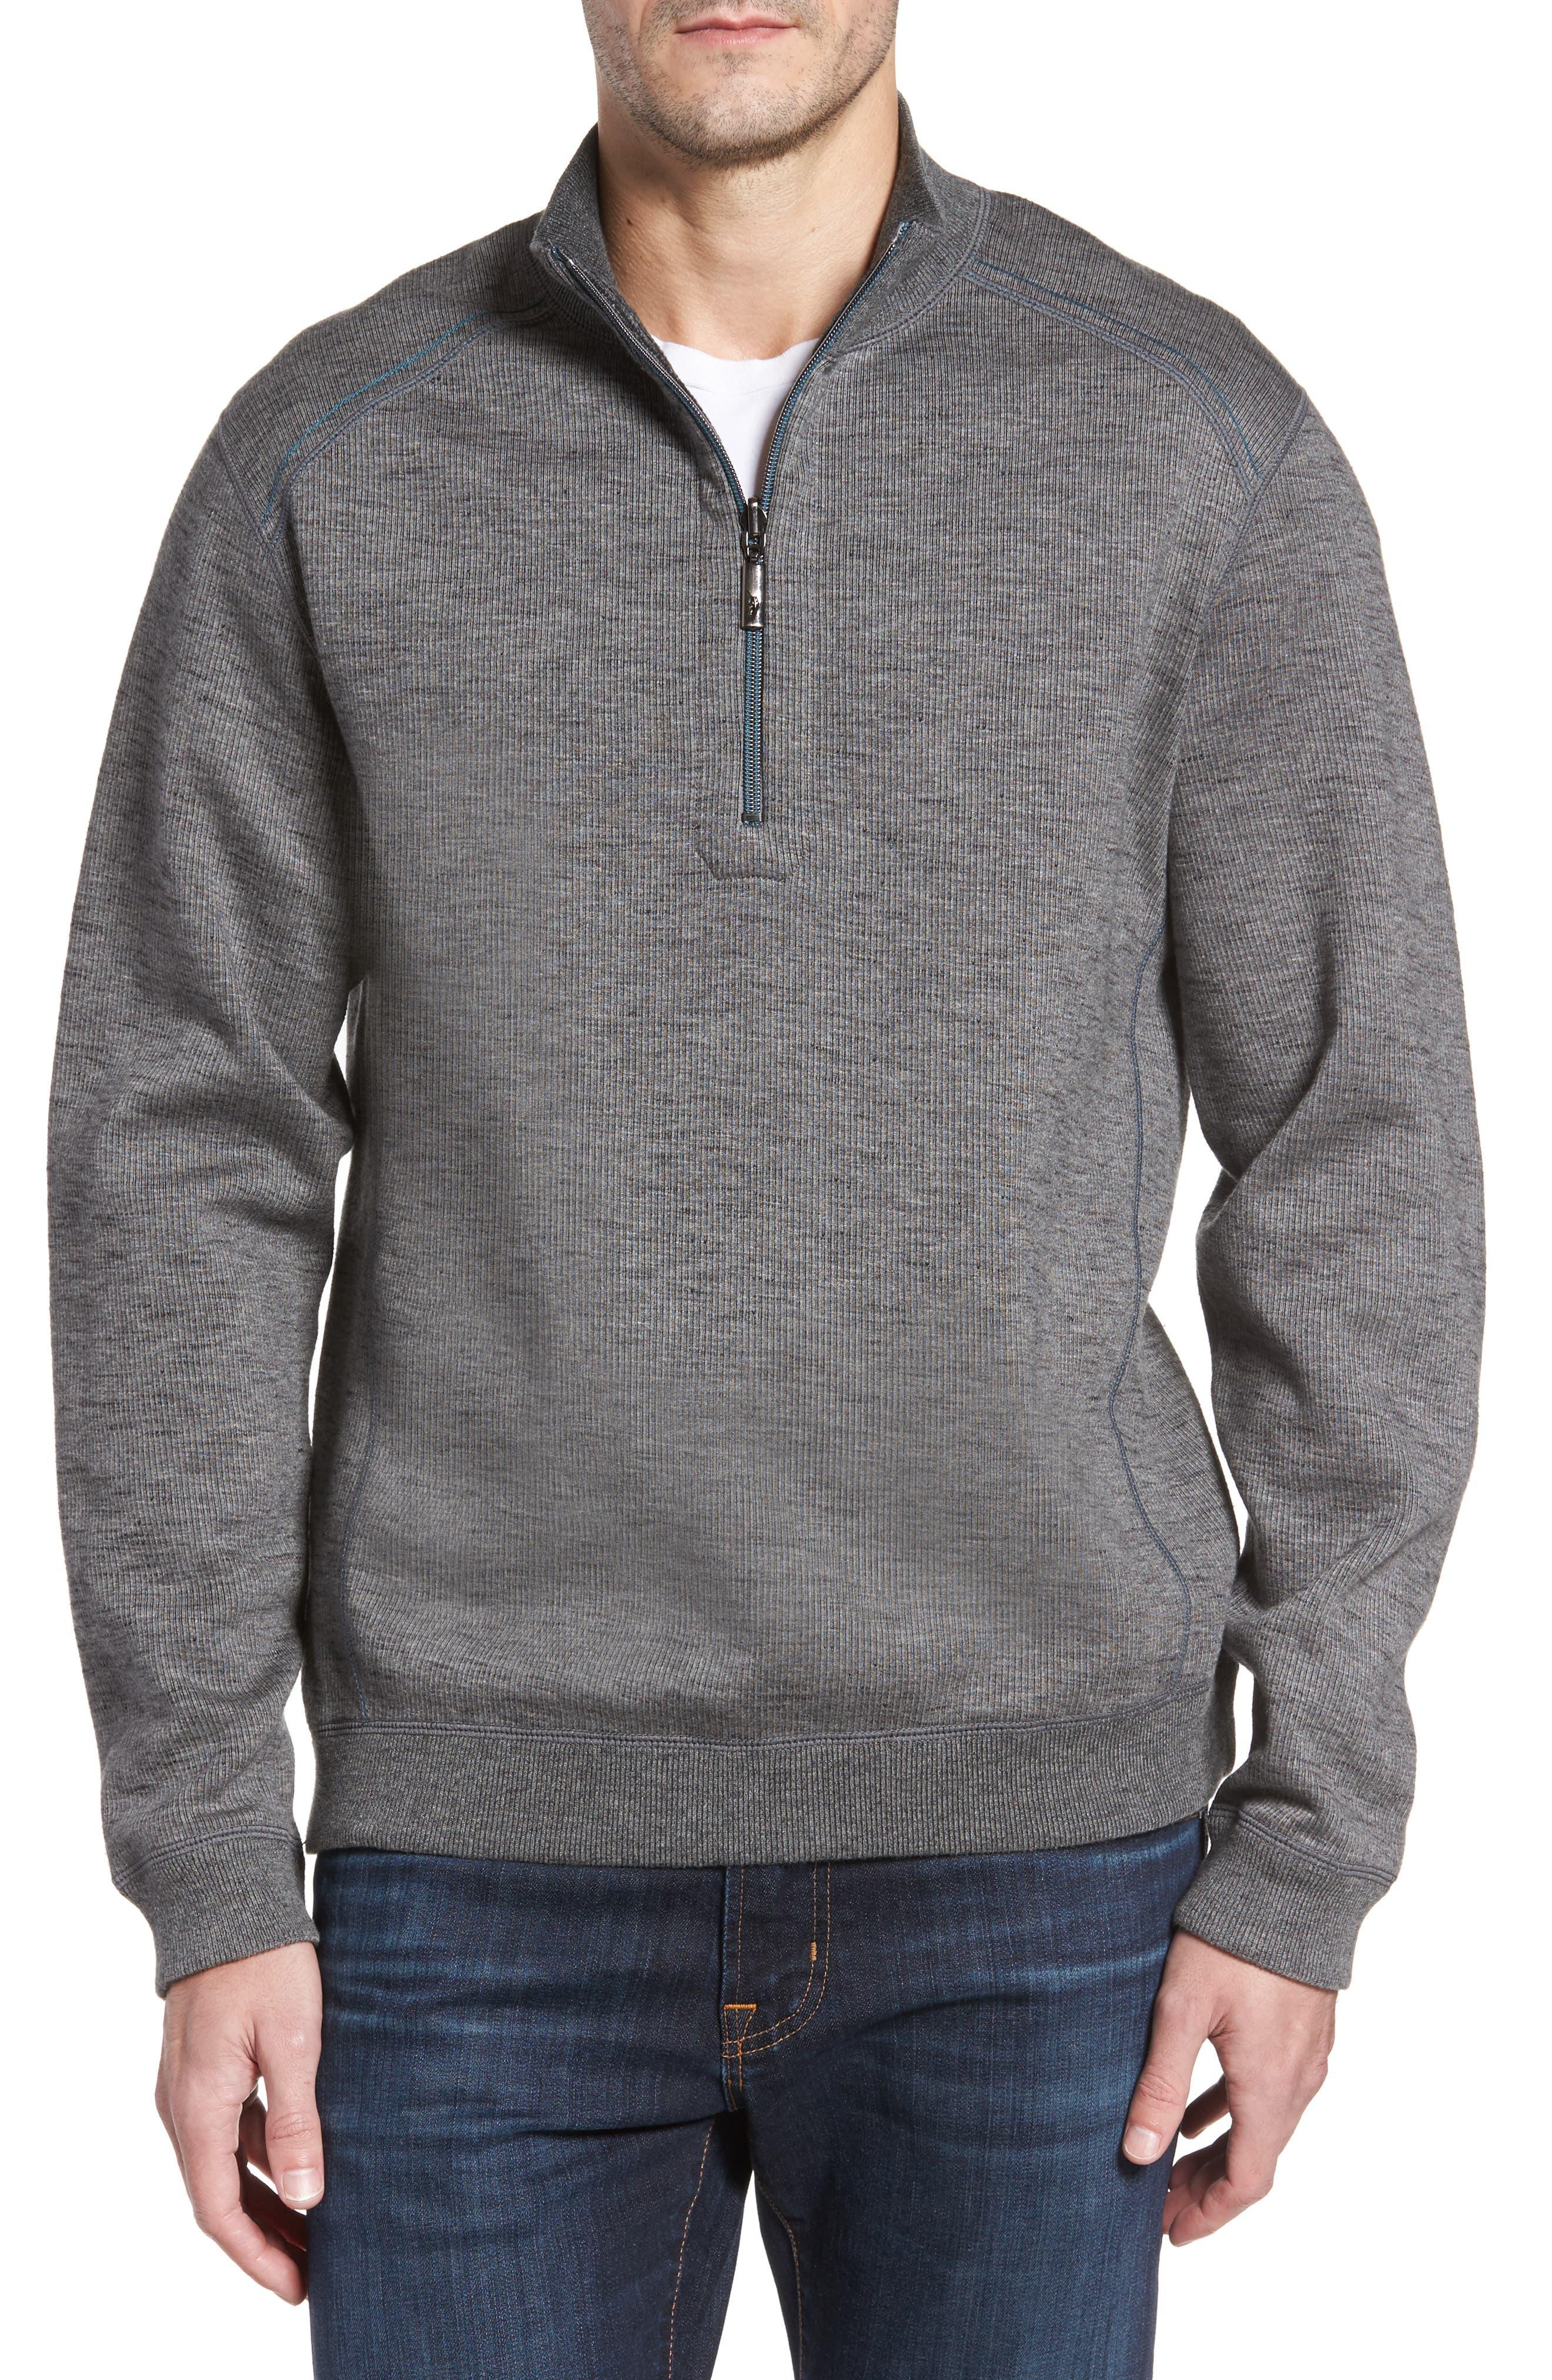 TOMMY BAHAMA Flipsider Half Zip Reversible Sweatshirt